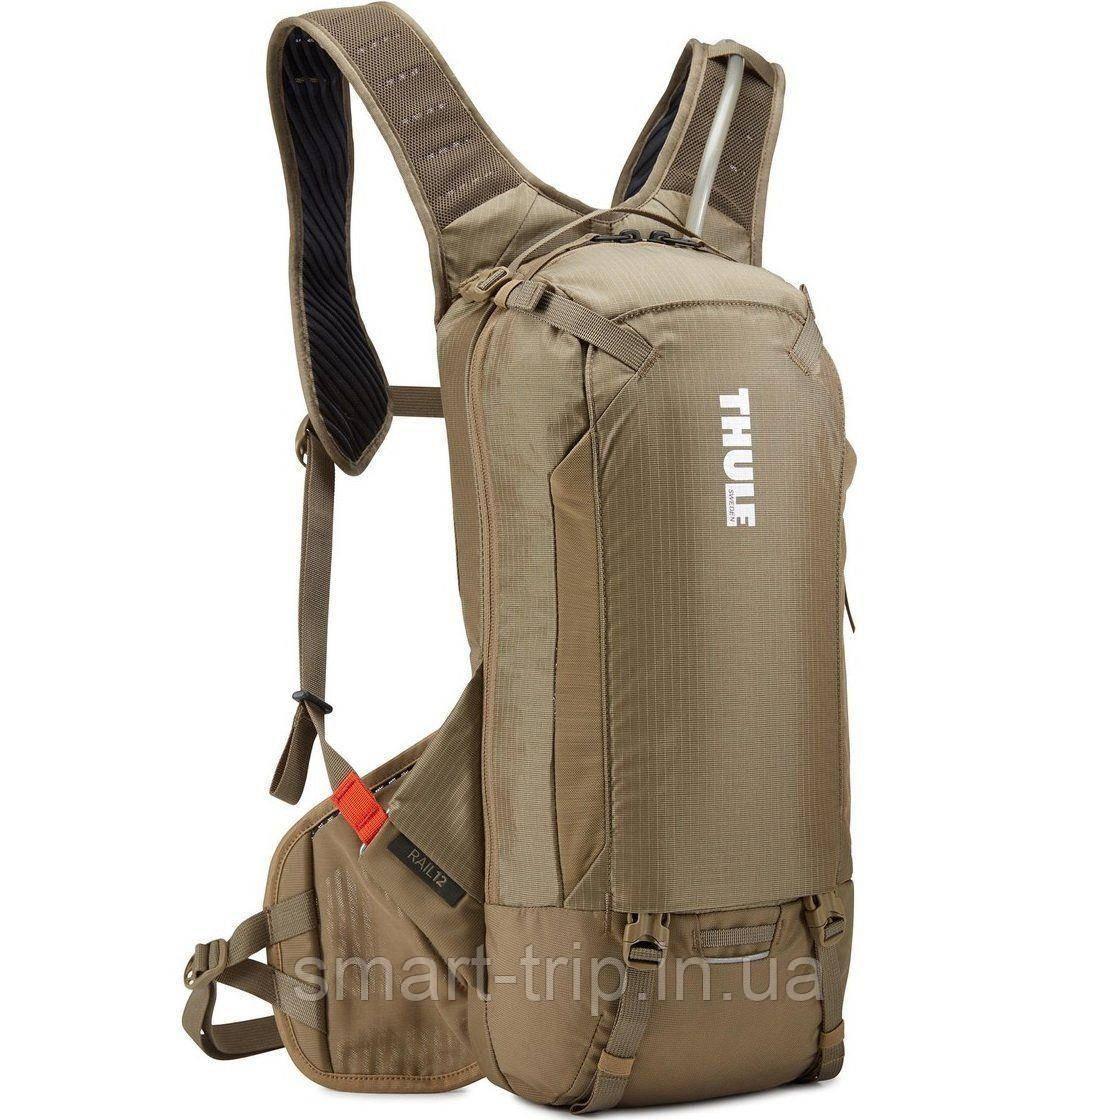 Гидратор рюкзак Thule Rail 12L (HydraPak 2,5 л)  Covert коричневый 3203798